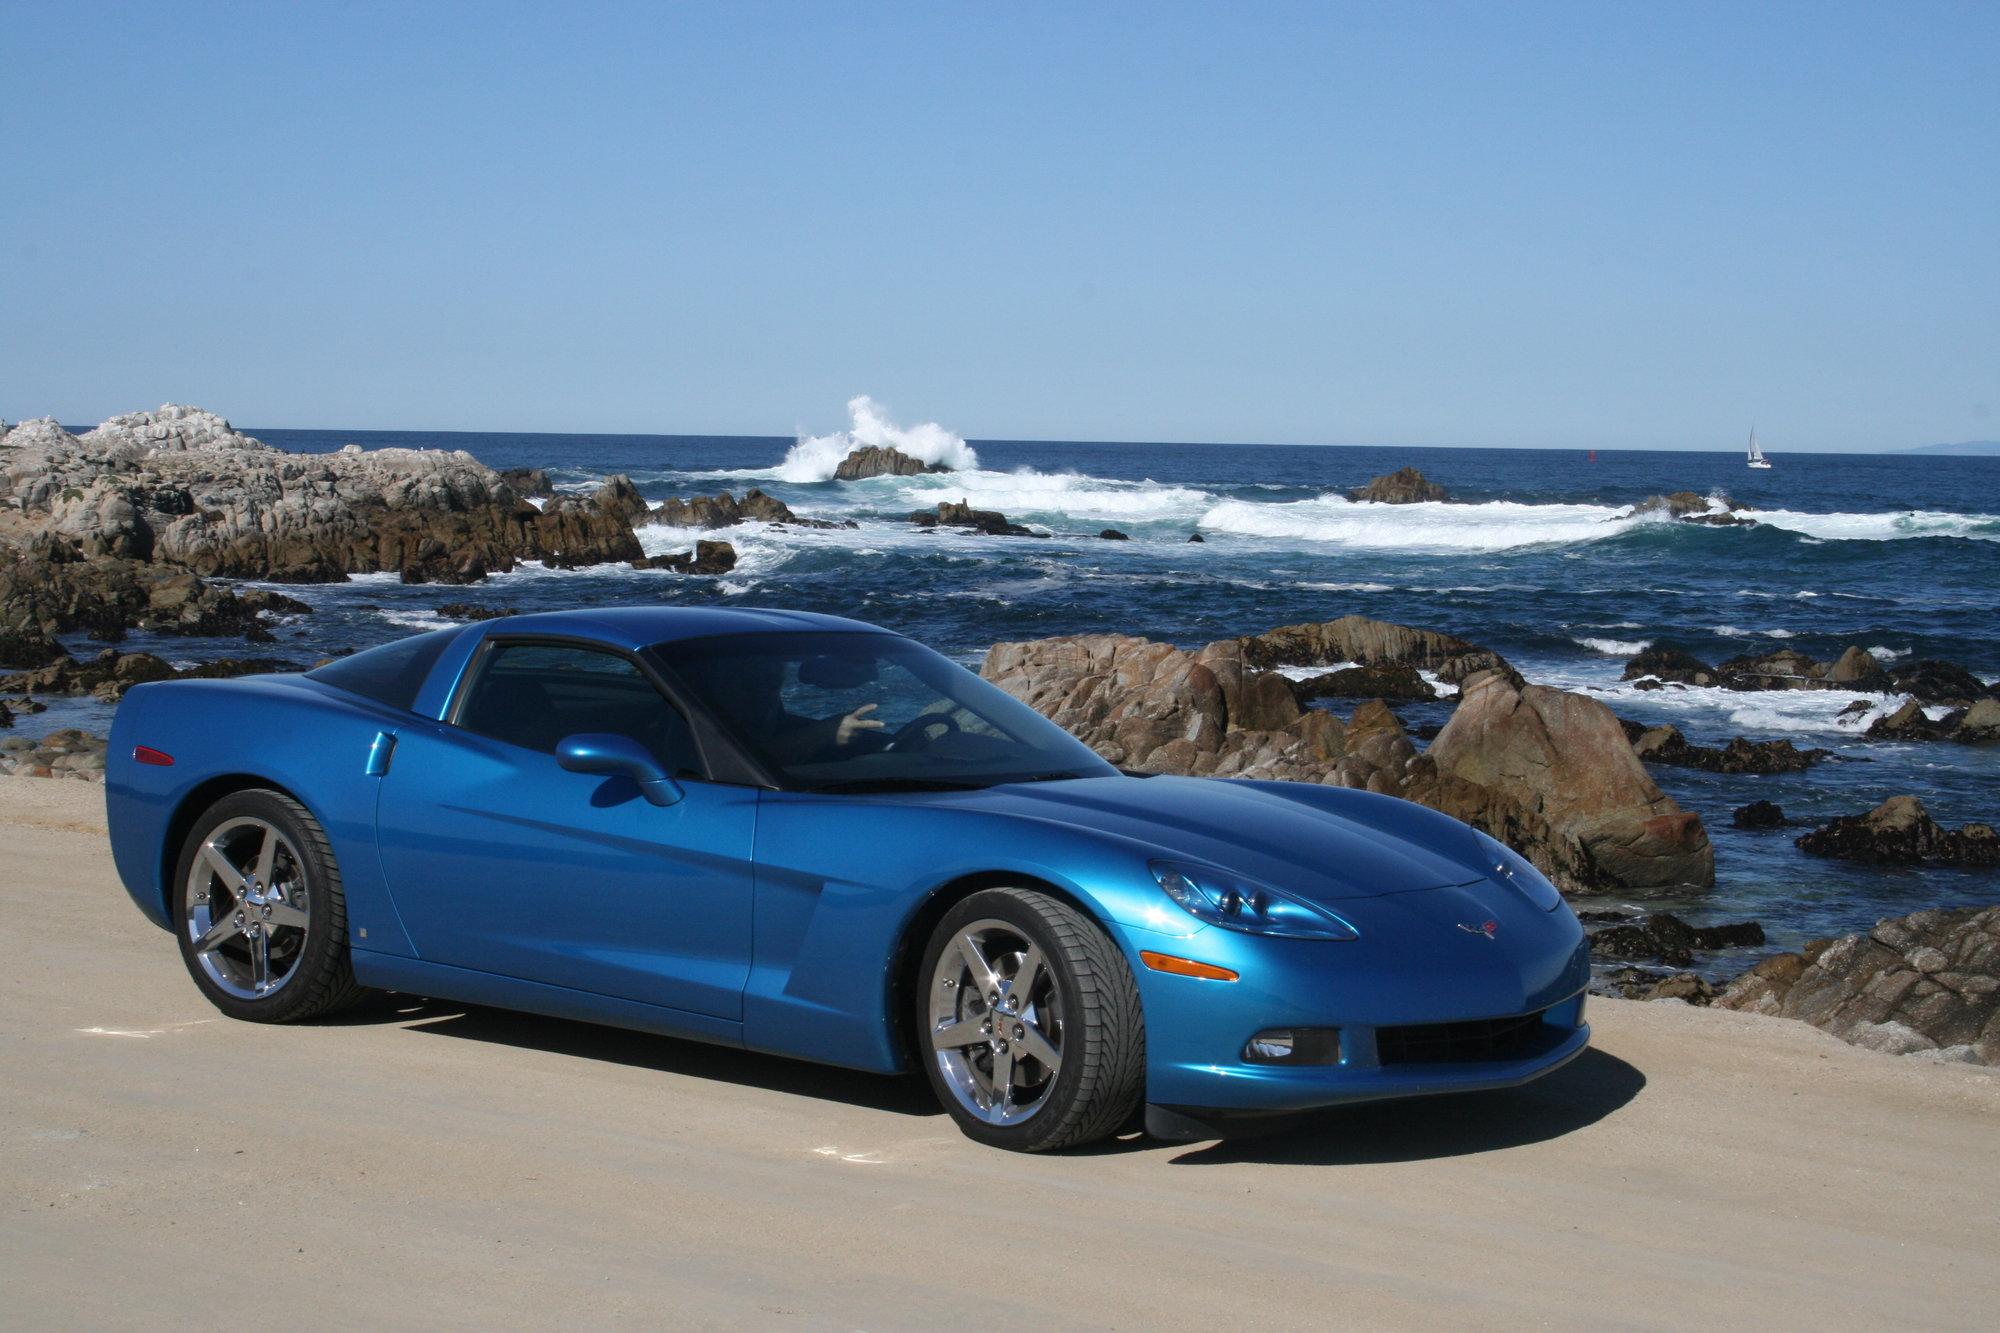 FS: 2008 Base Corvette JSB 6spd man, 22K milesFS: 2008 Base Corvette JSB 6spd man, 22K miles